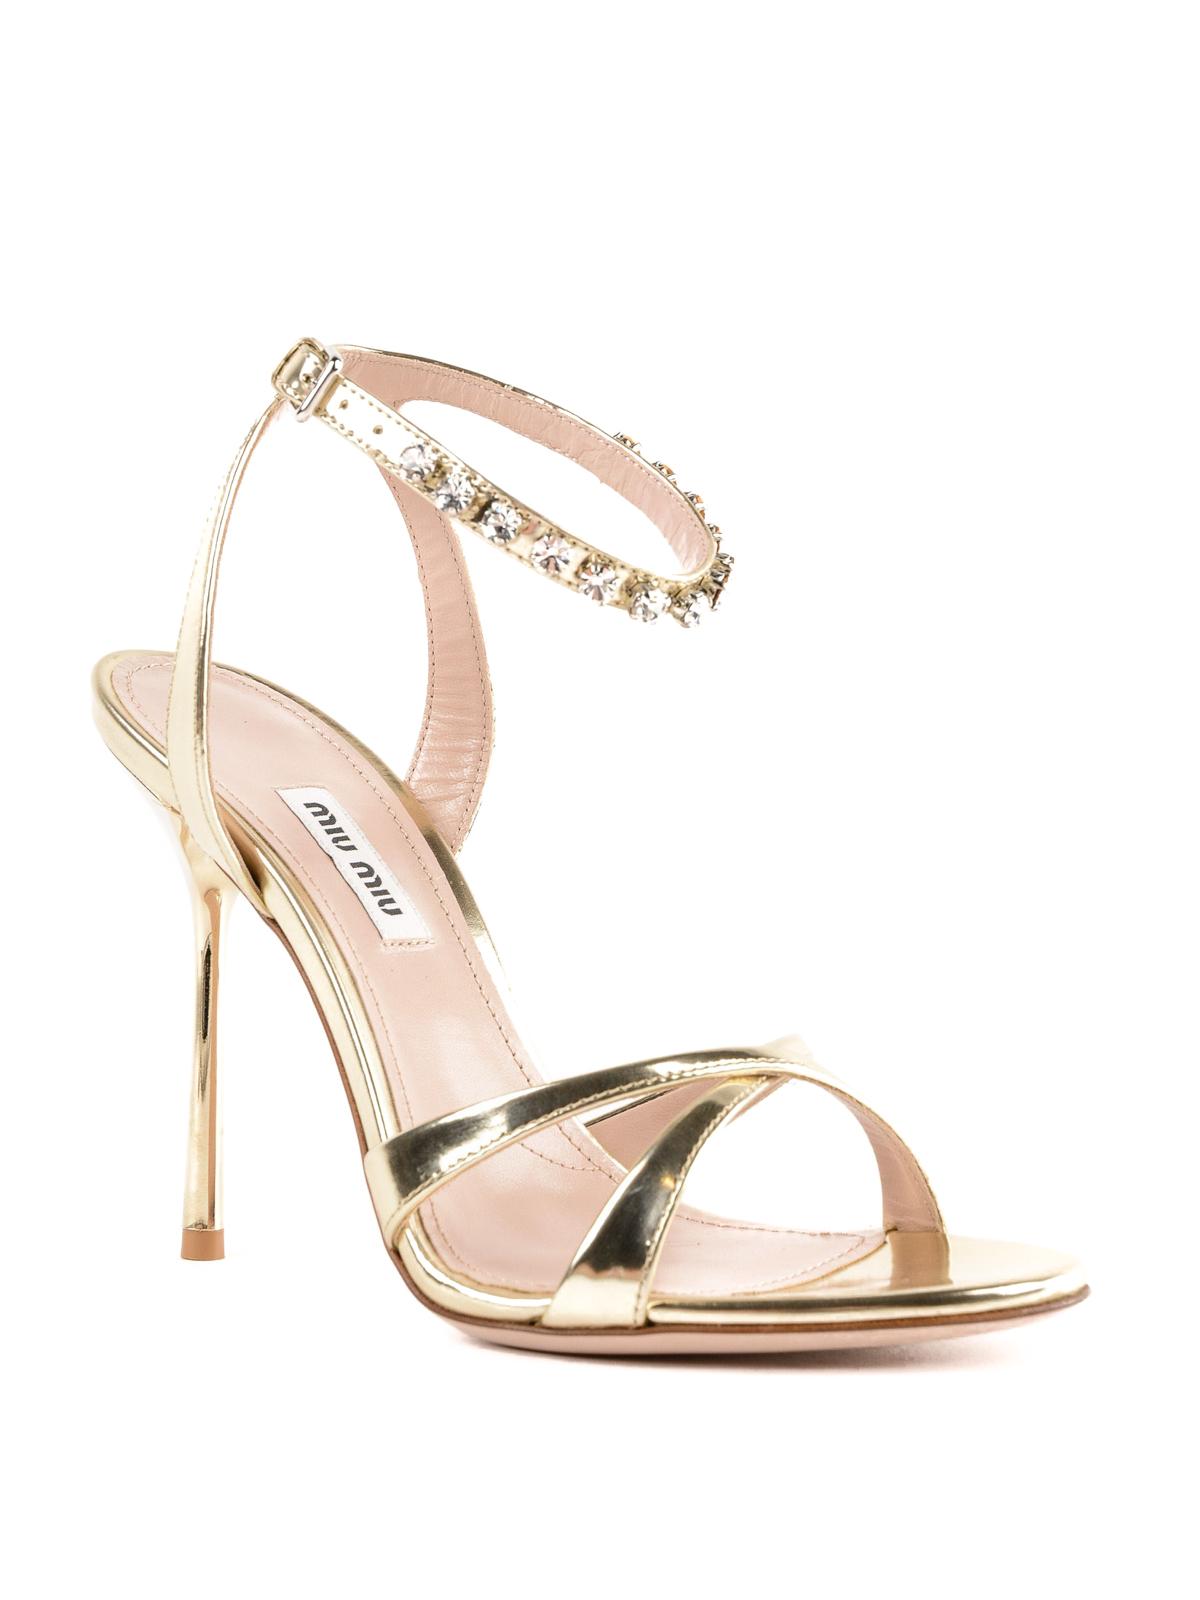 c0e4cff519ee MIU MIU  sandals online - Jewel ankle strap heeled gold sandals